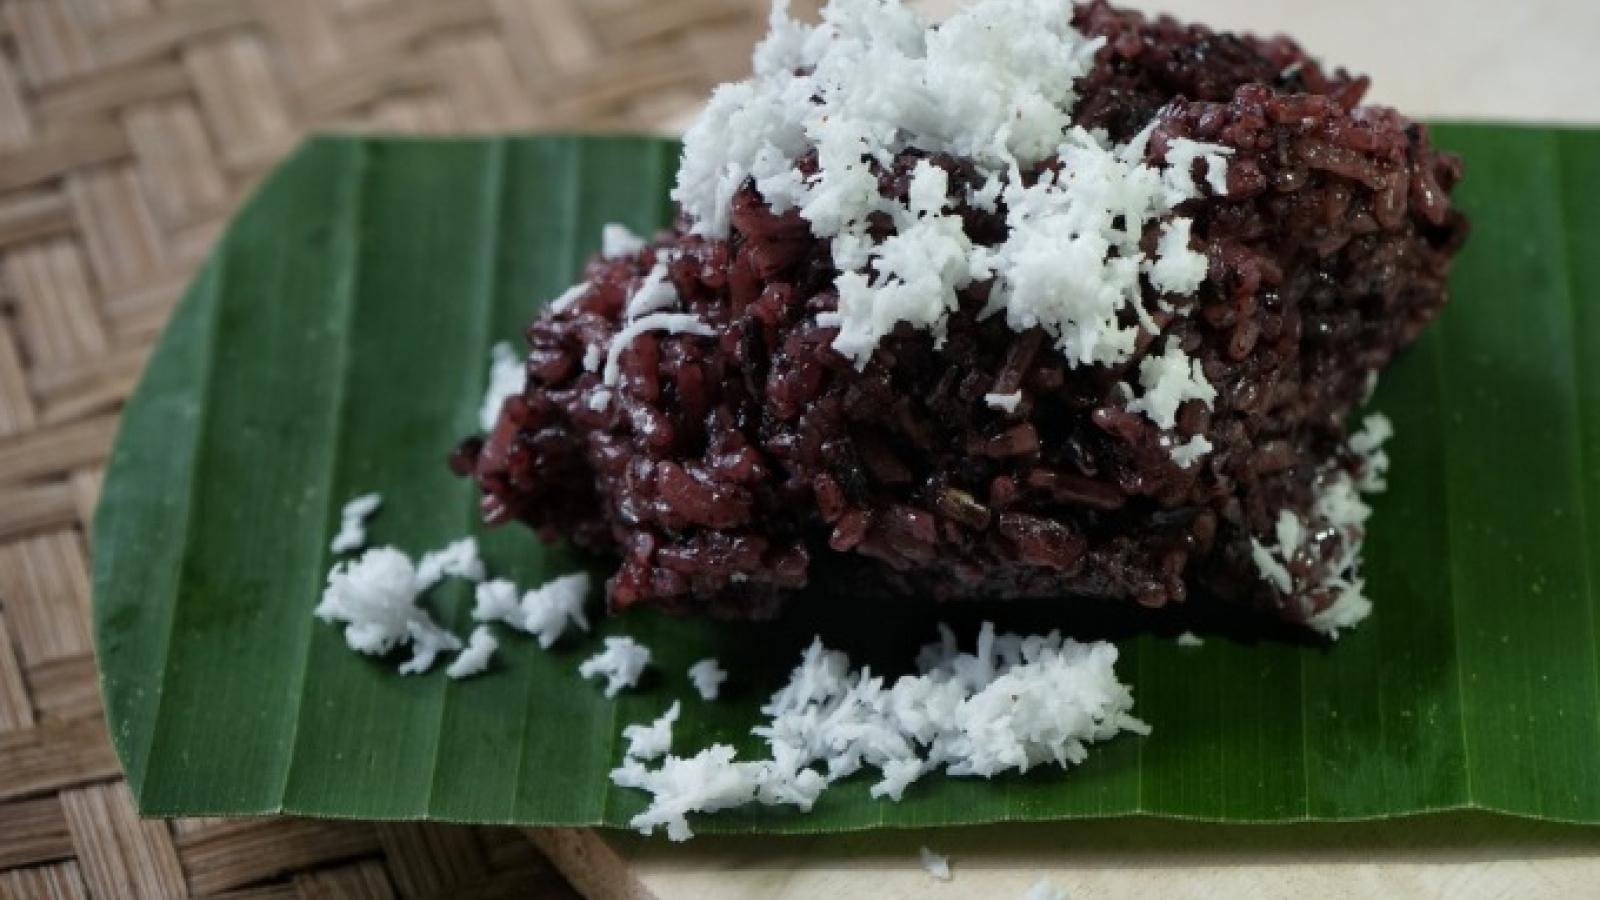 Coconut sticky rice a rare treat on Hanoi streets